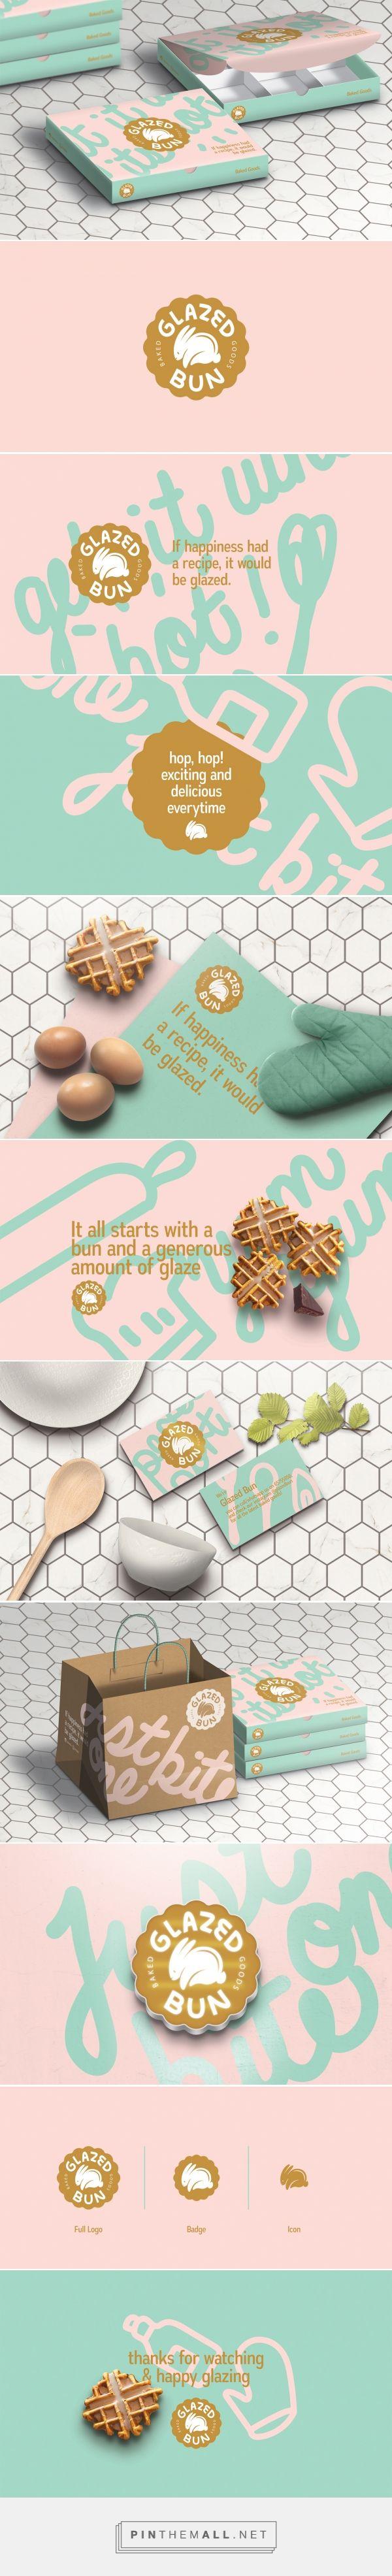 Glazed Bun Branding by Studio AIO on Behance   Fivestar Branding – Design and Branding Agency & Inspiration Gallery